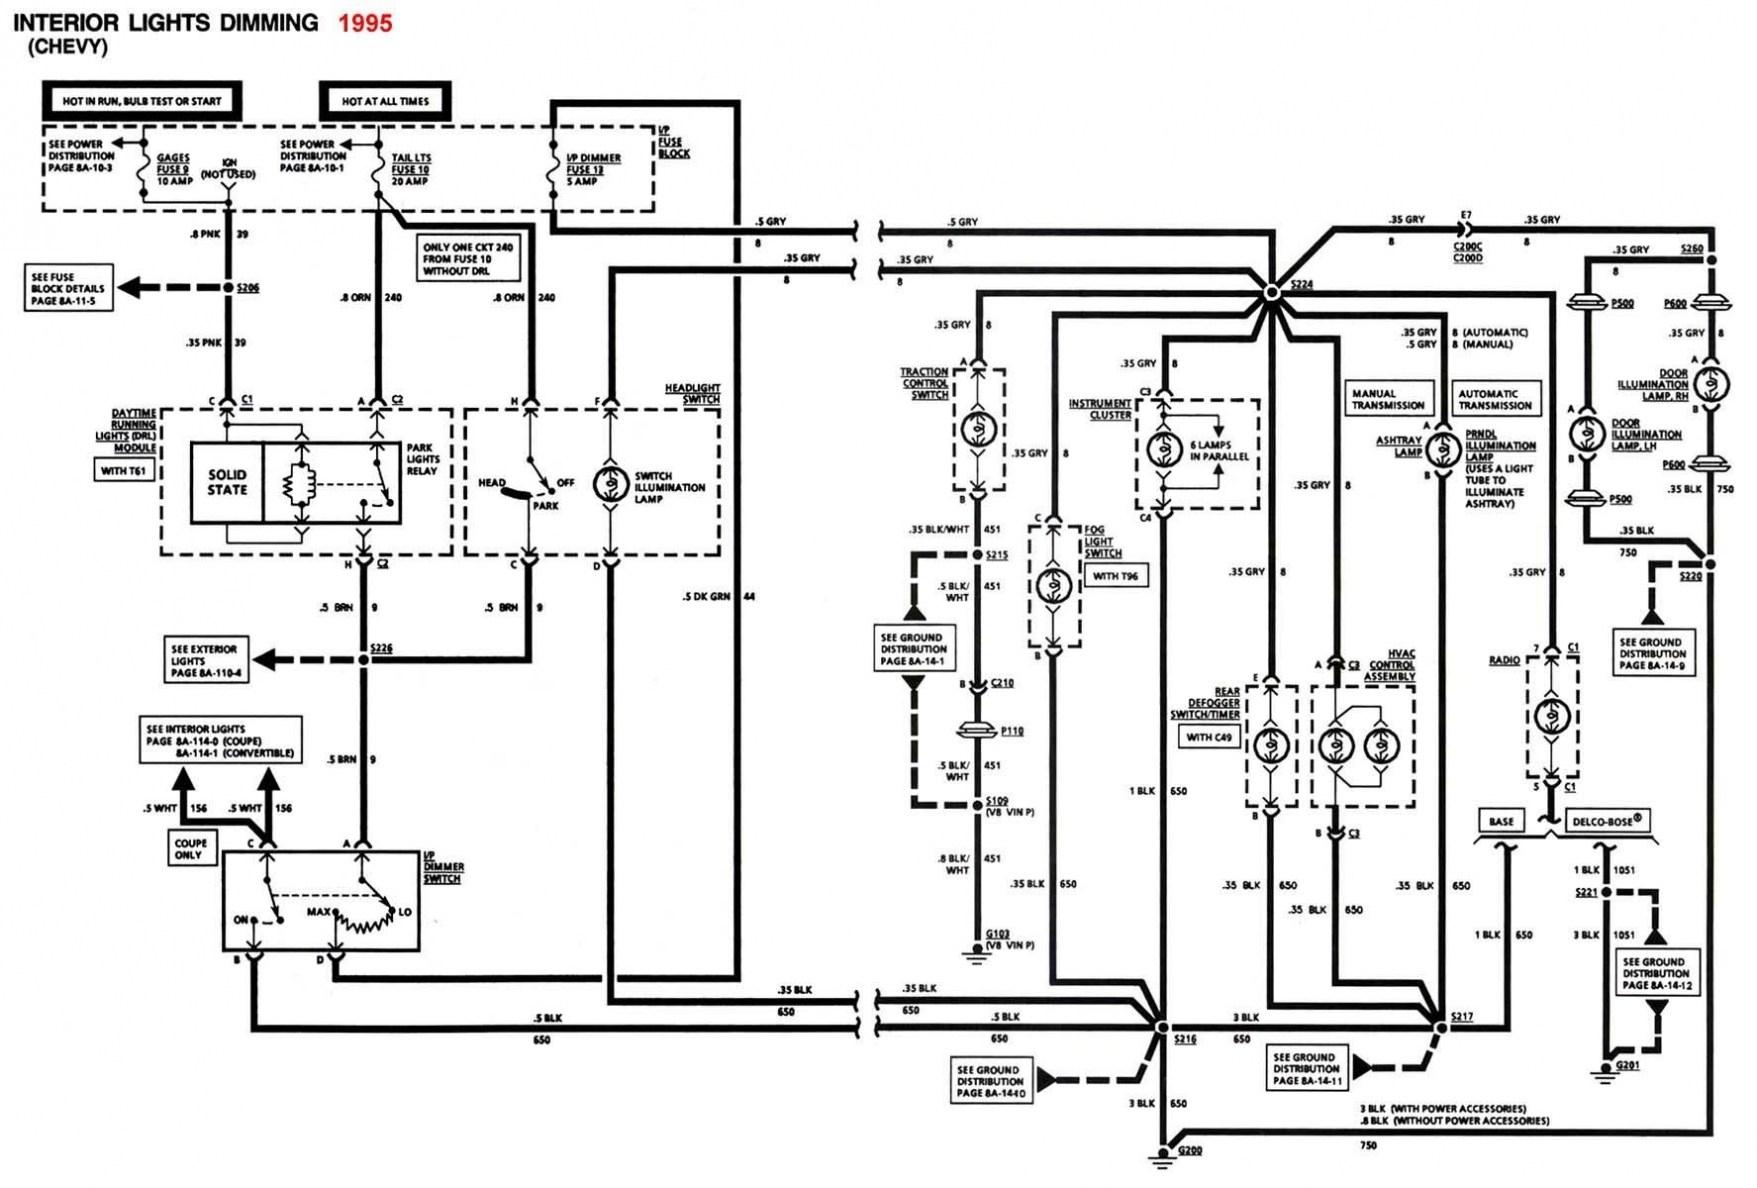 Winnebago Ac Wiring Diagram Free Picture Schematic | Wiring Diagram - Winnebago Motorhome Wiring Diagram